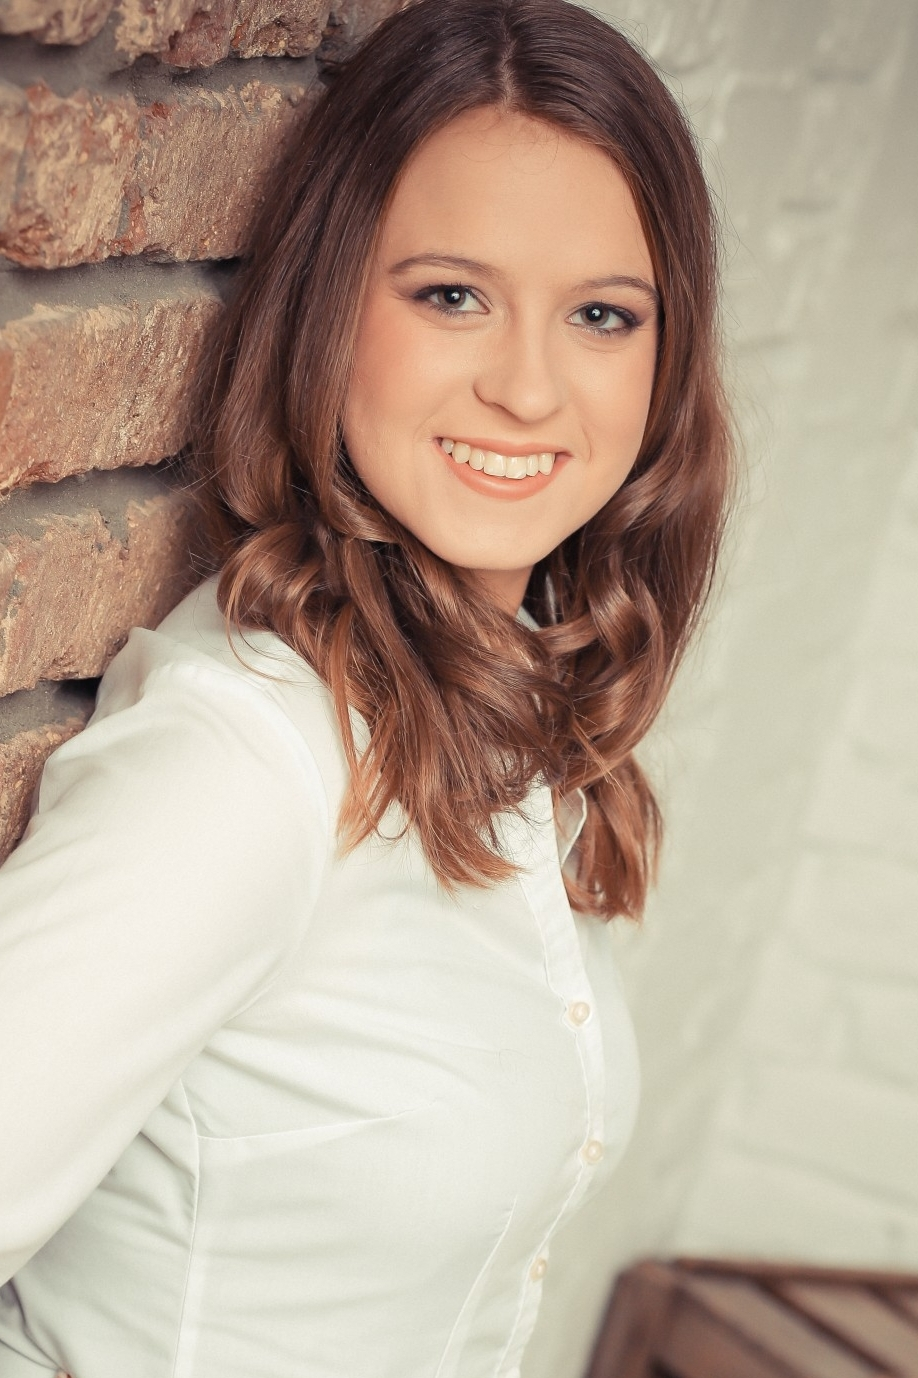 Lisa-Sophie - Waitress / Promoter in Aachen & Köln